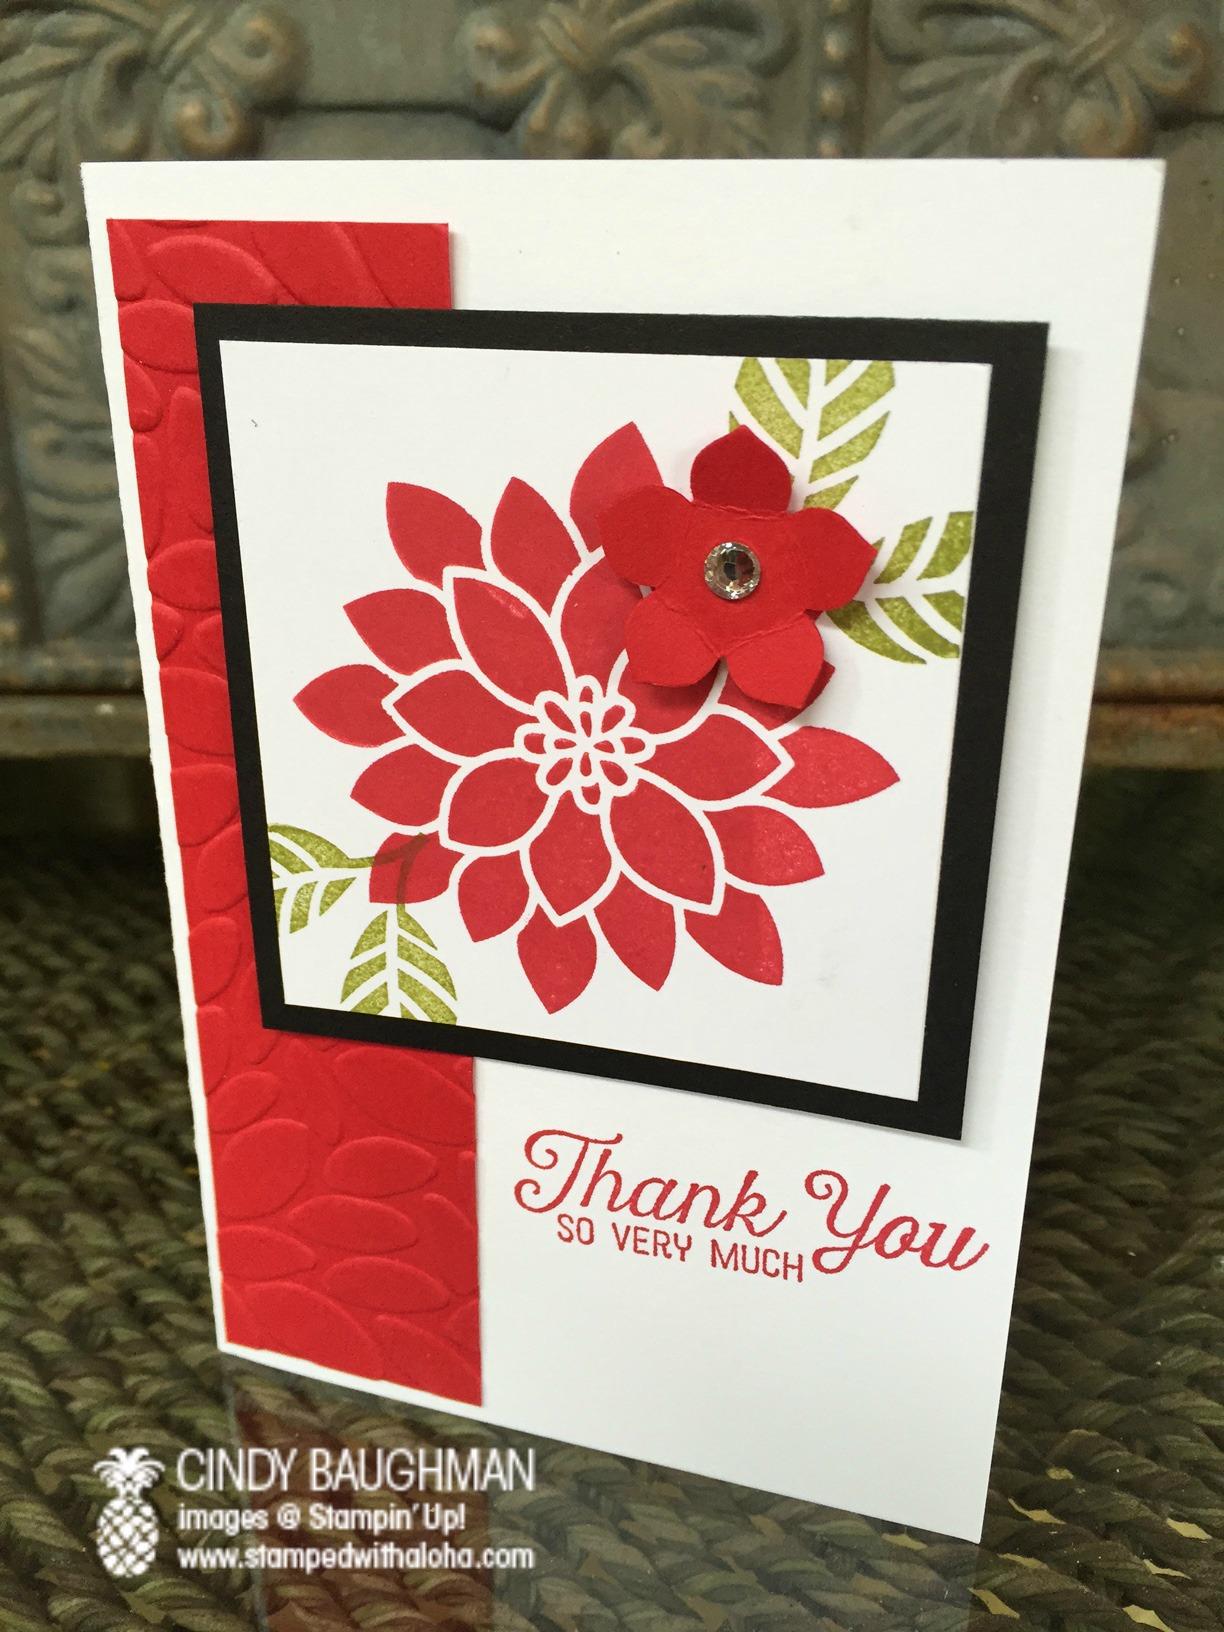 Flourishing Phrases Thank You card - www.stampedwithaloha.com